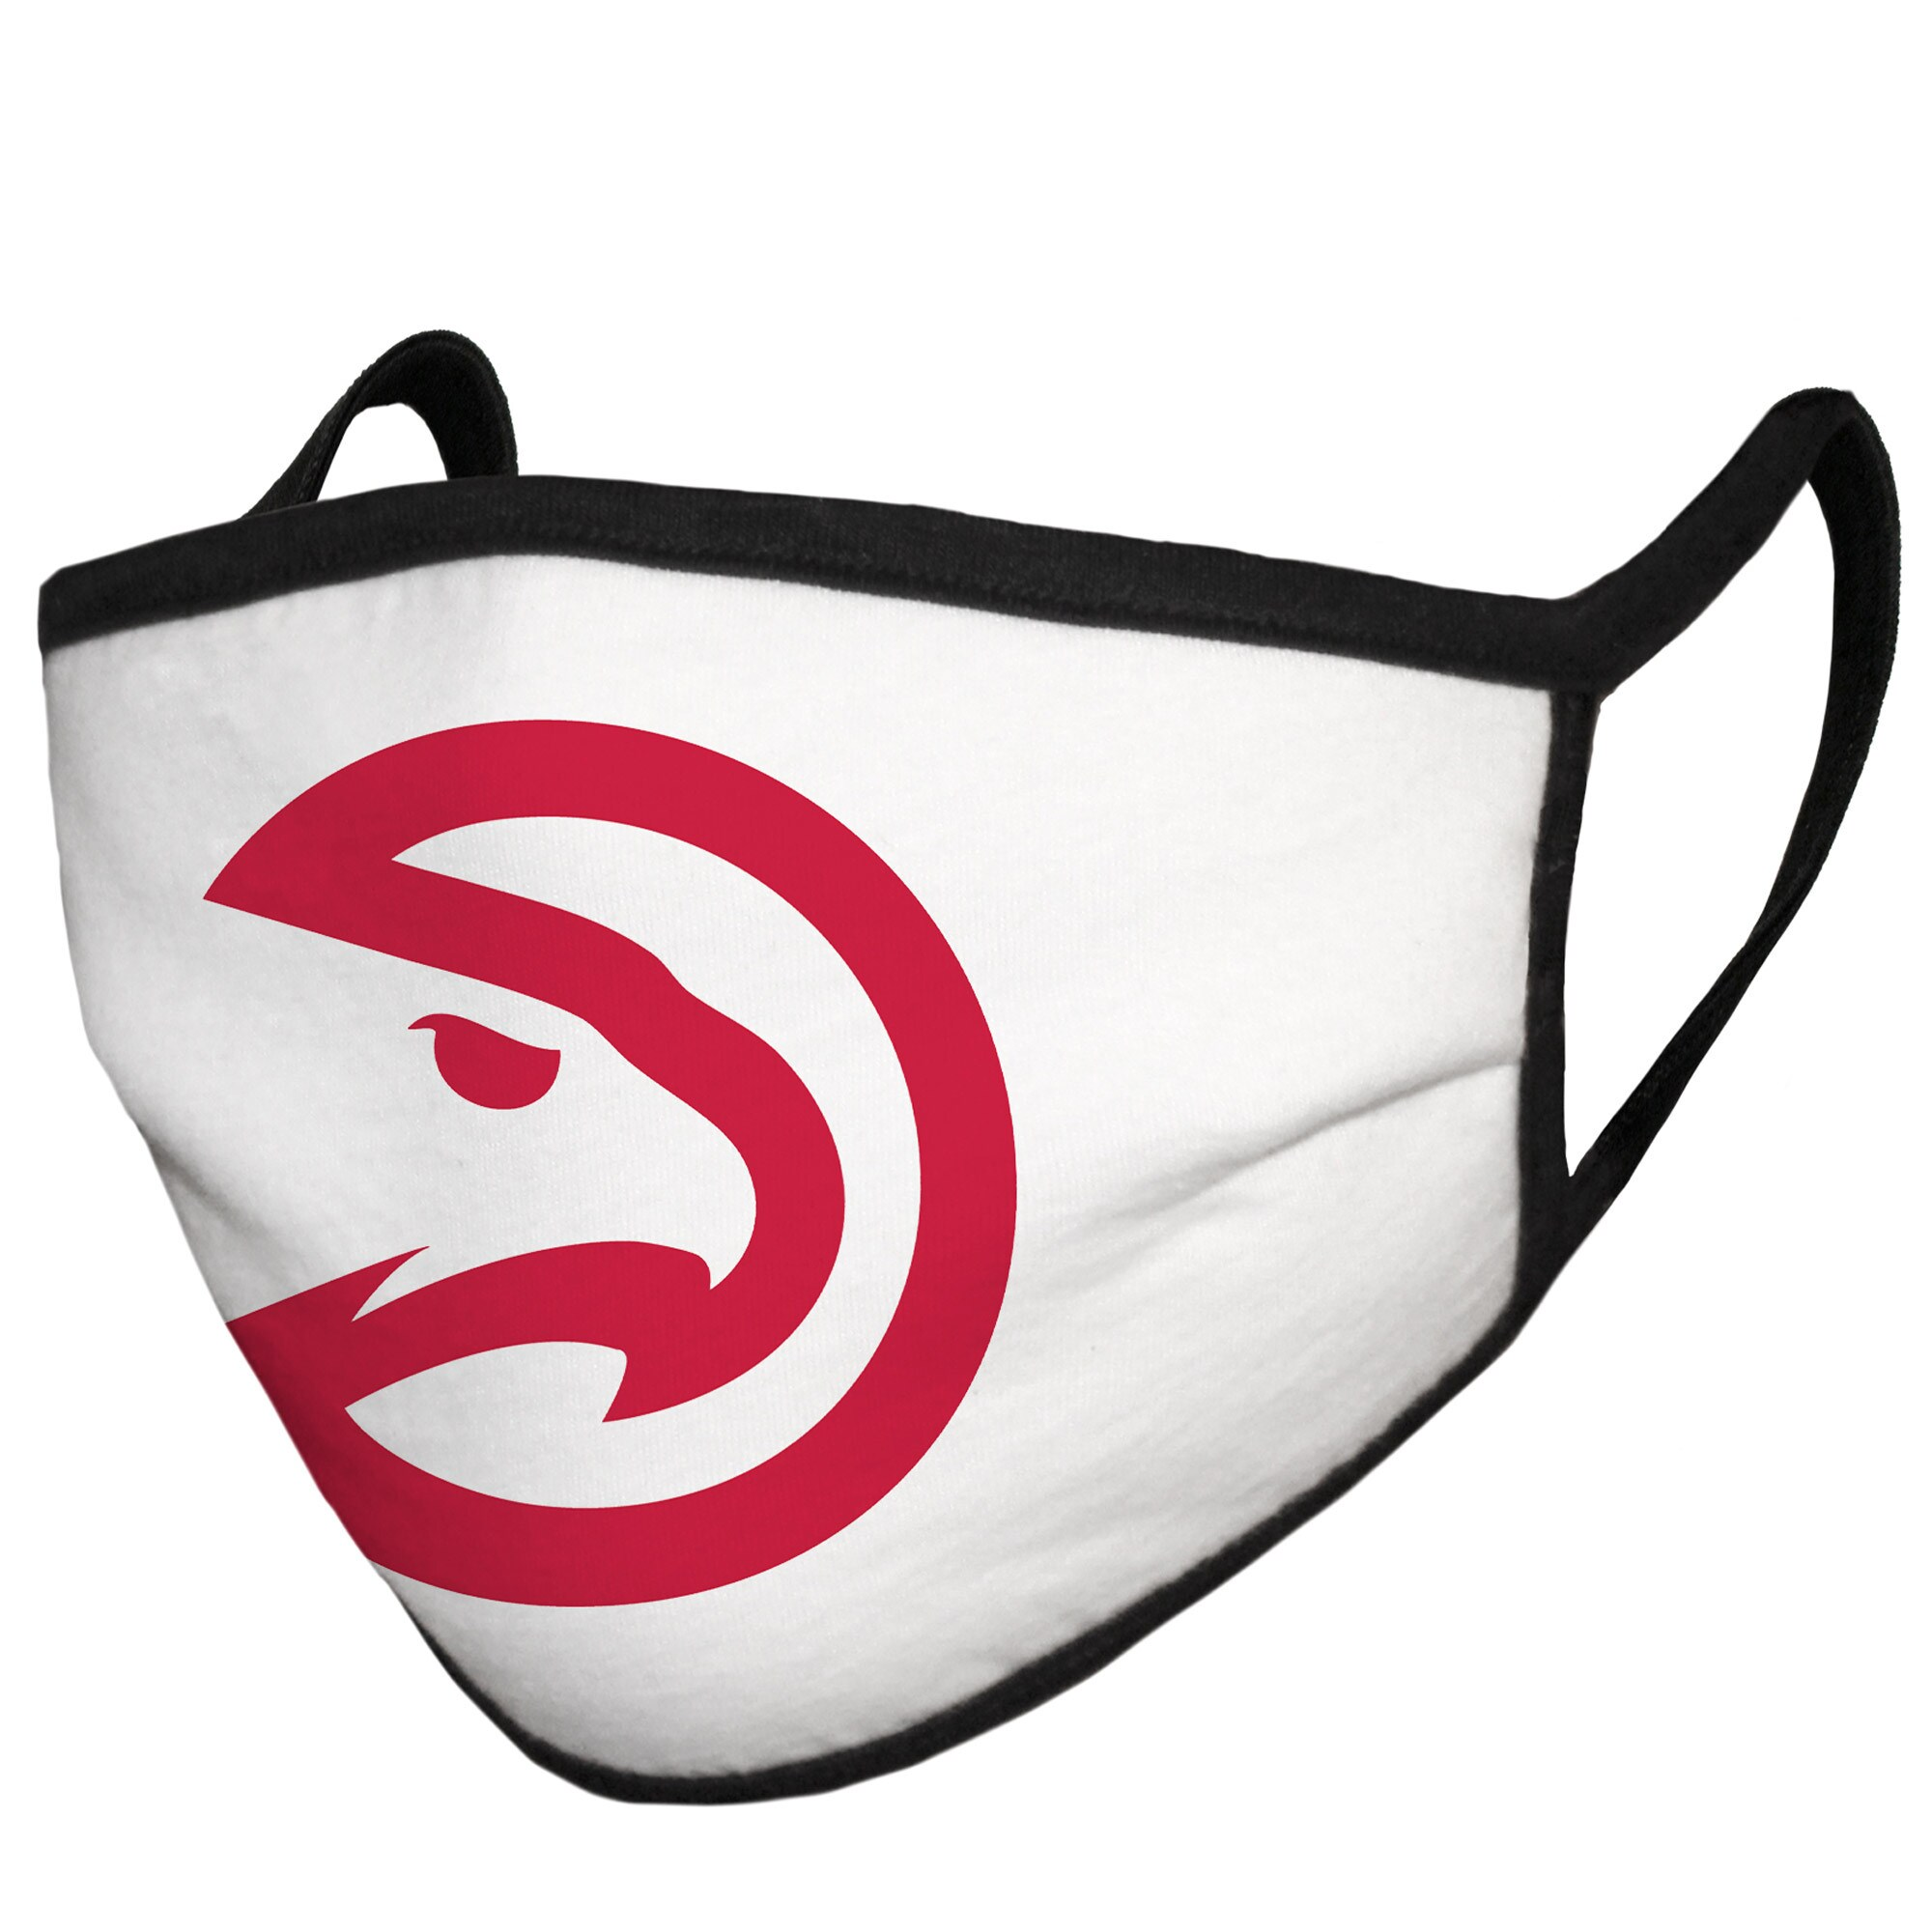 Atlanta Hawks Fanatics Branded Cloth Face Covering (Size Small) - MADE IN USA